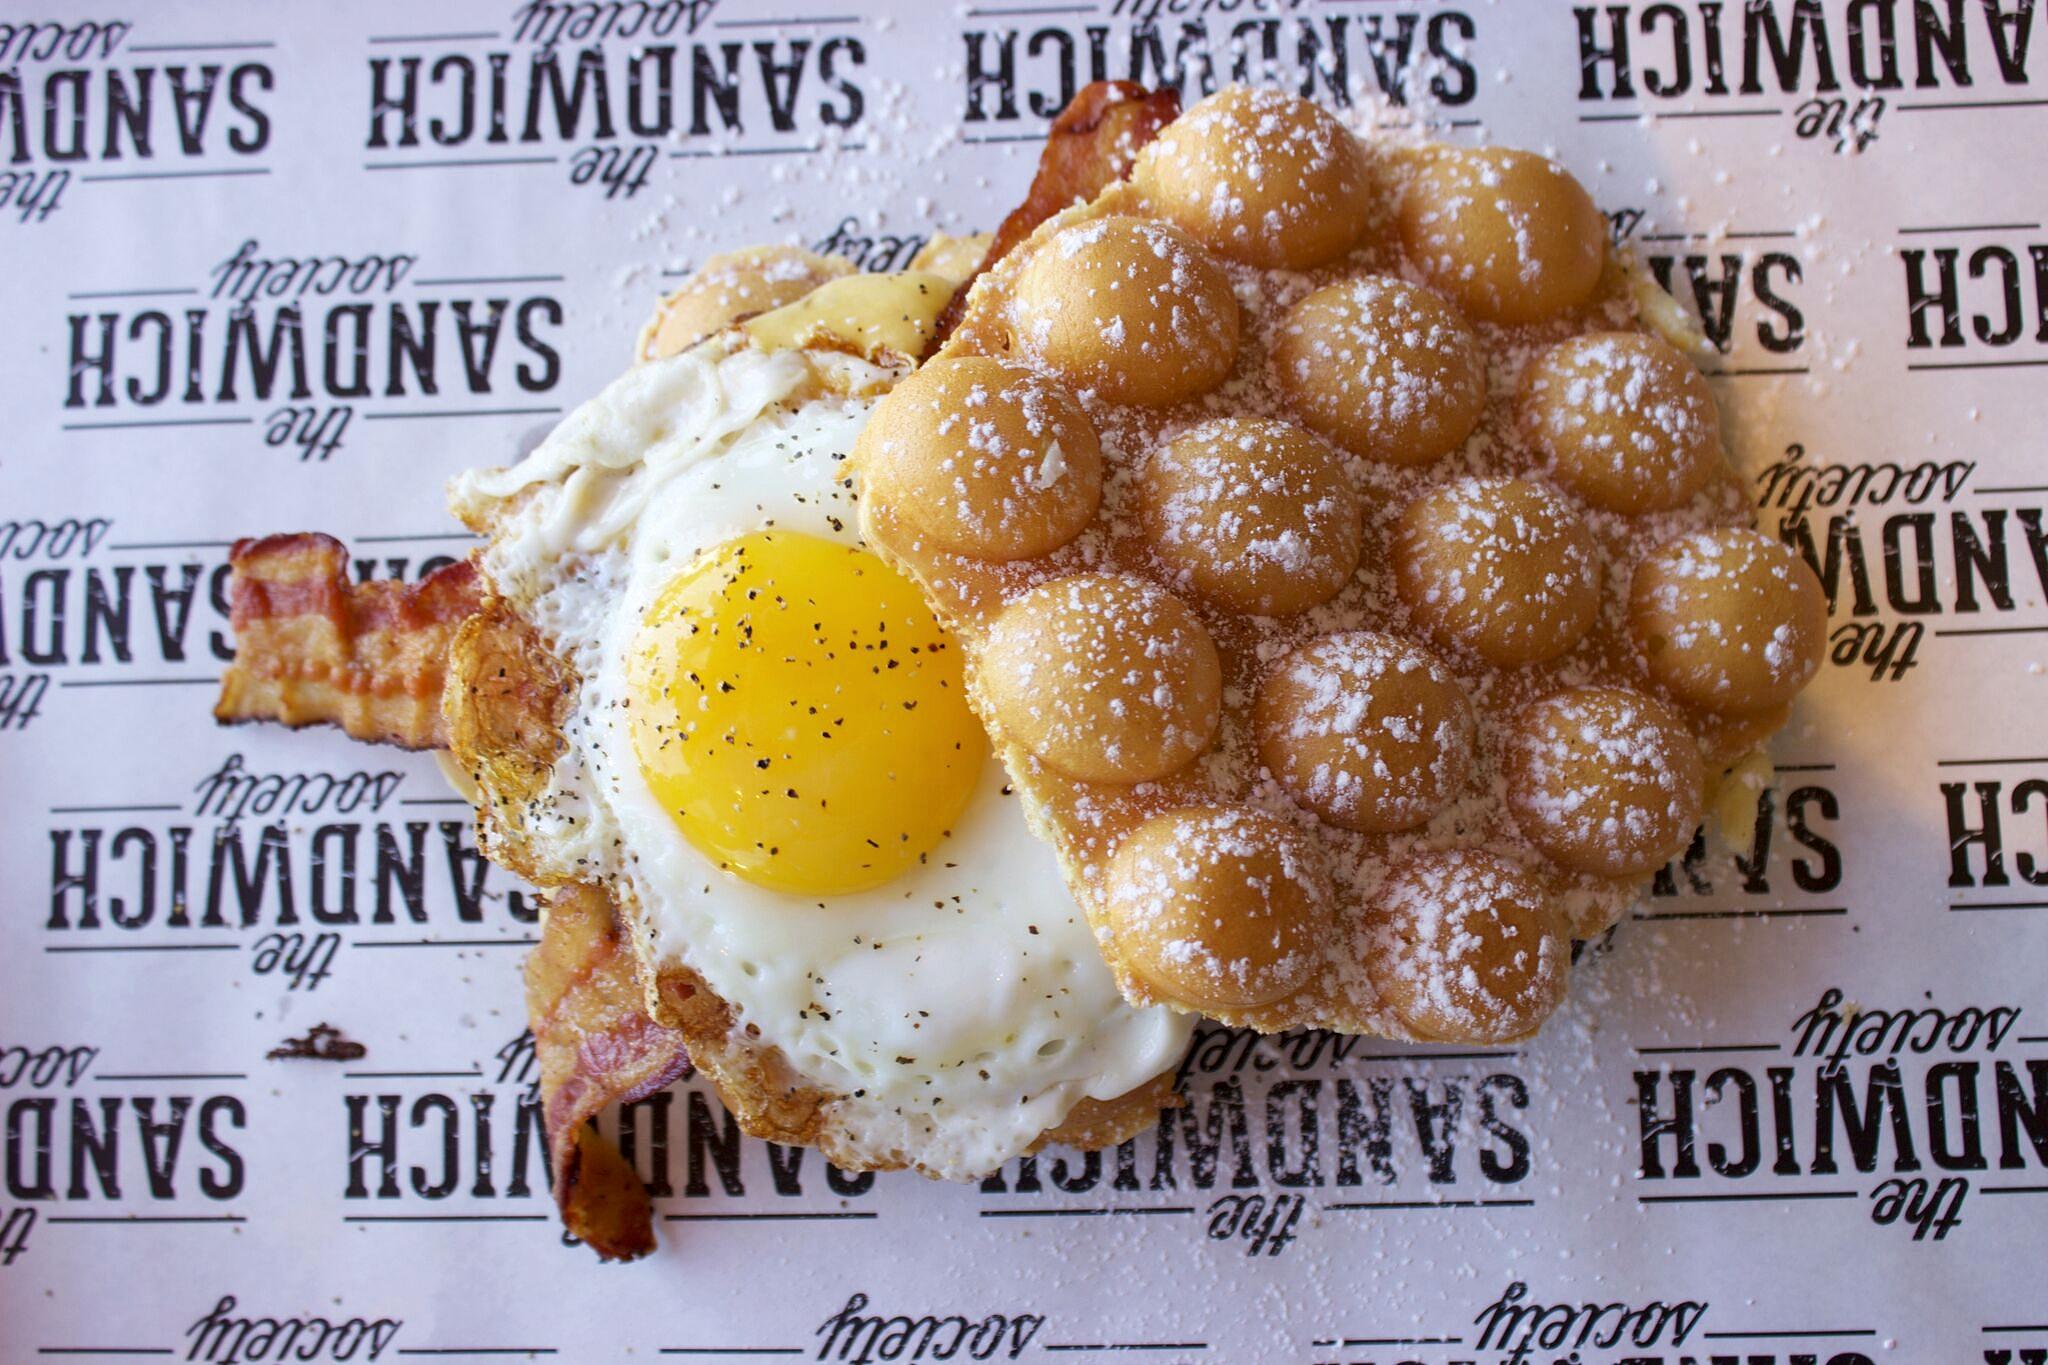 The Bubble Waffle Sandwich | photo courtesy of 100eats